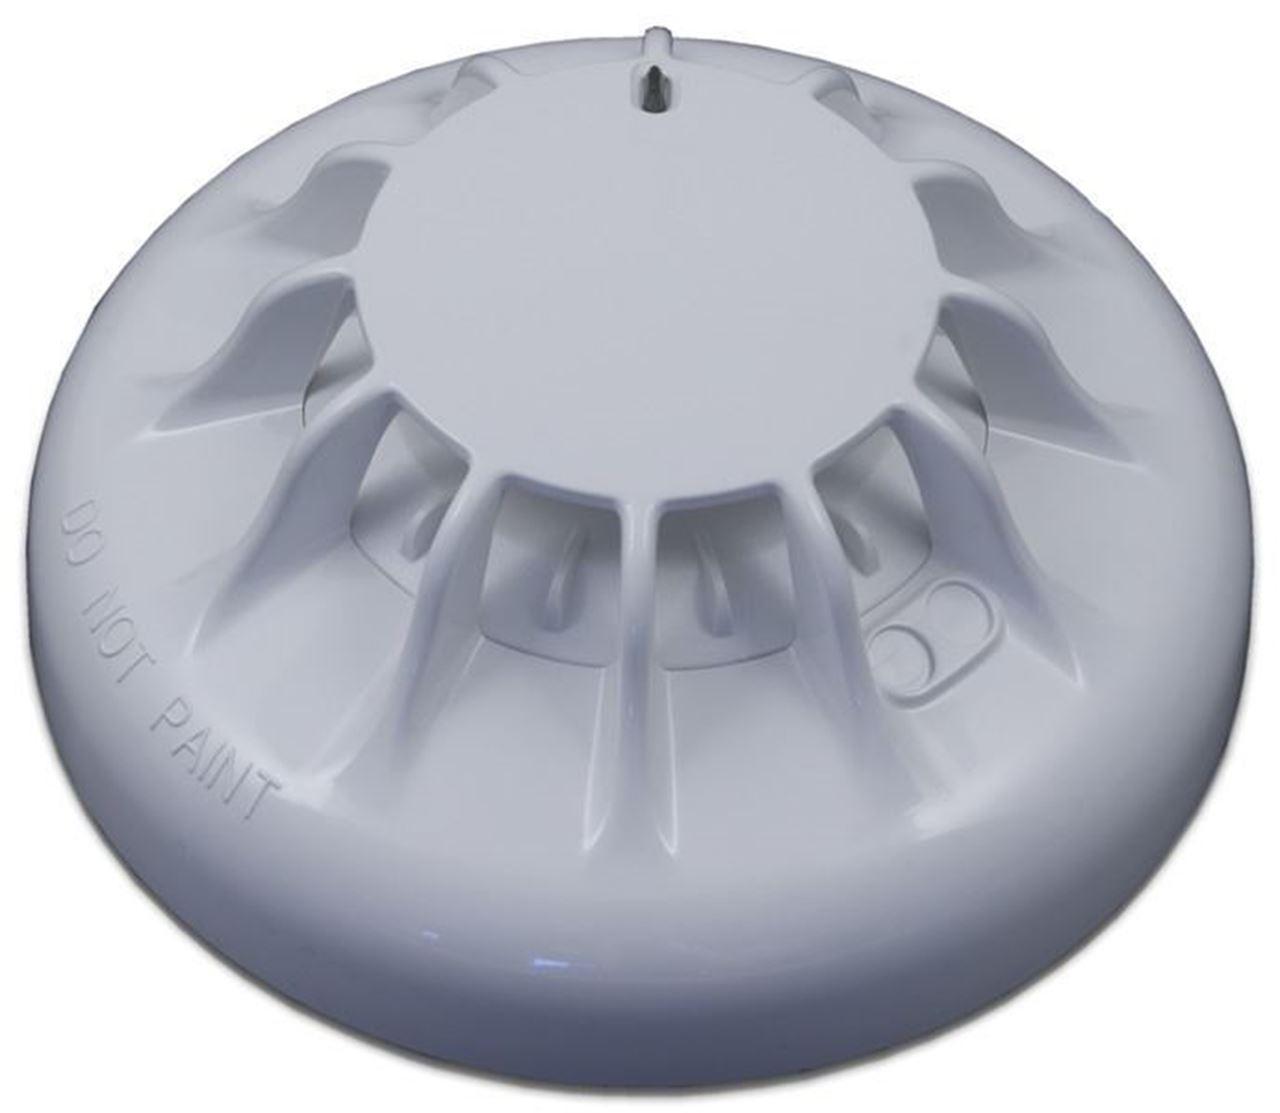 Bentel security BFC460H - Heat Detector Armenia Vantag LLC